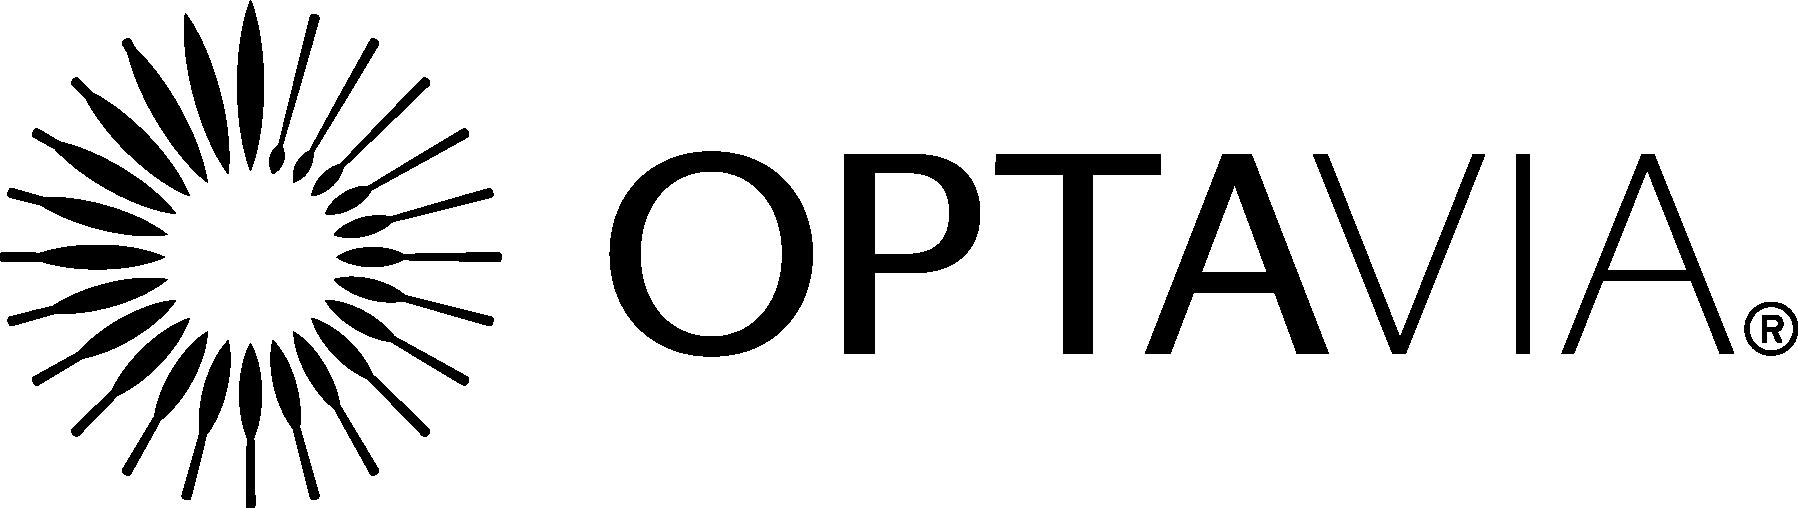 optavia-horiz-blk.png